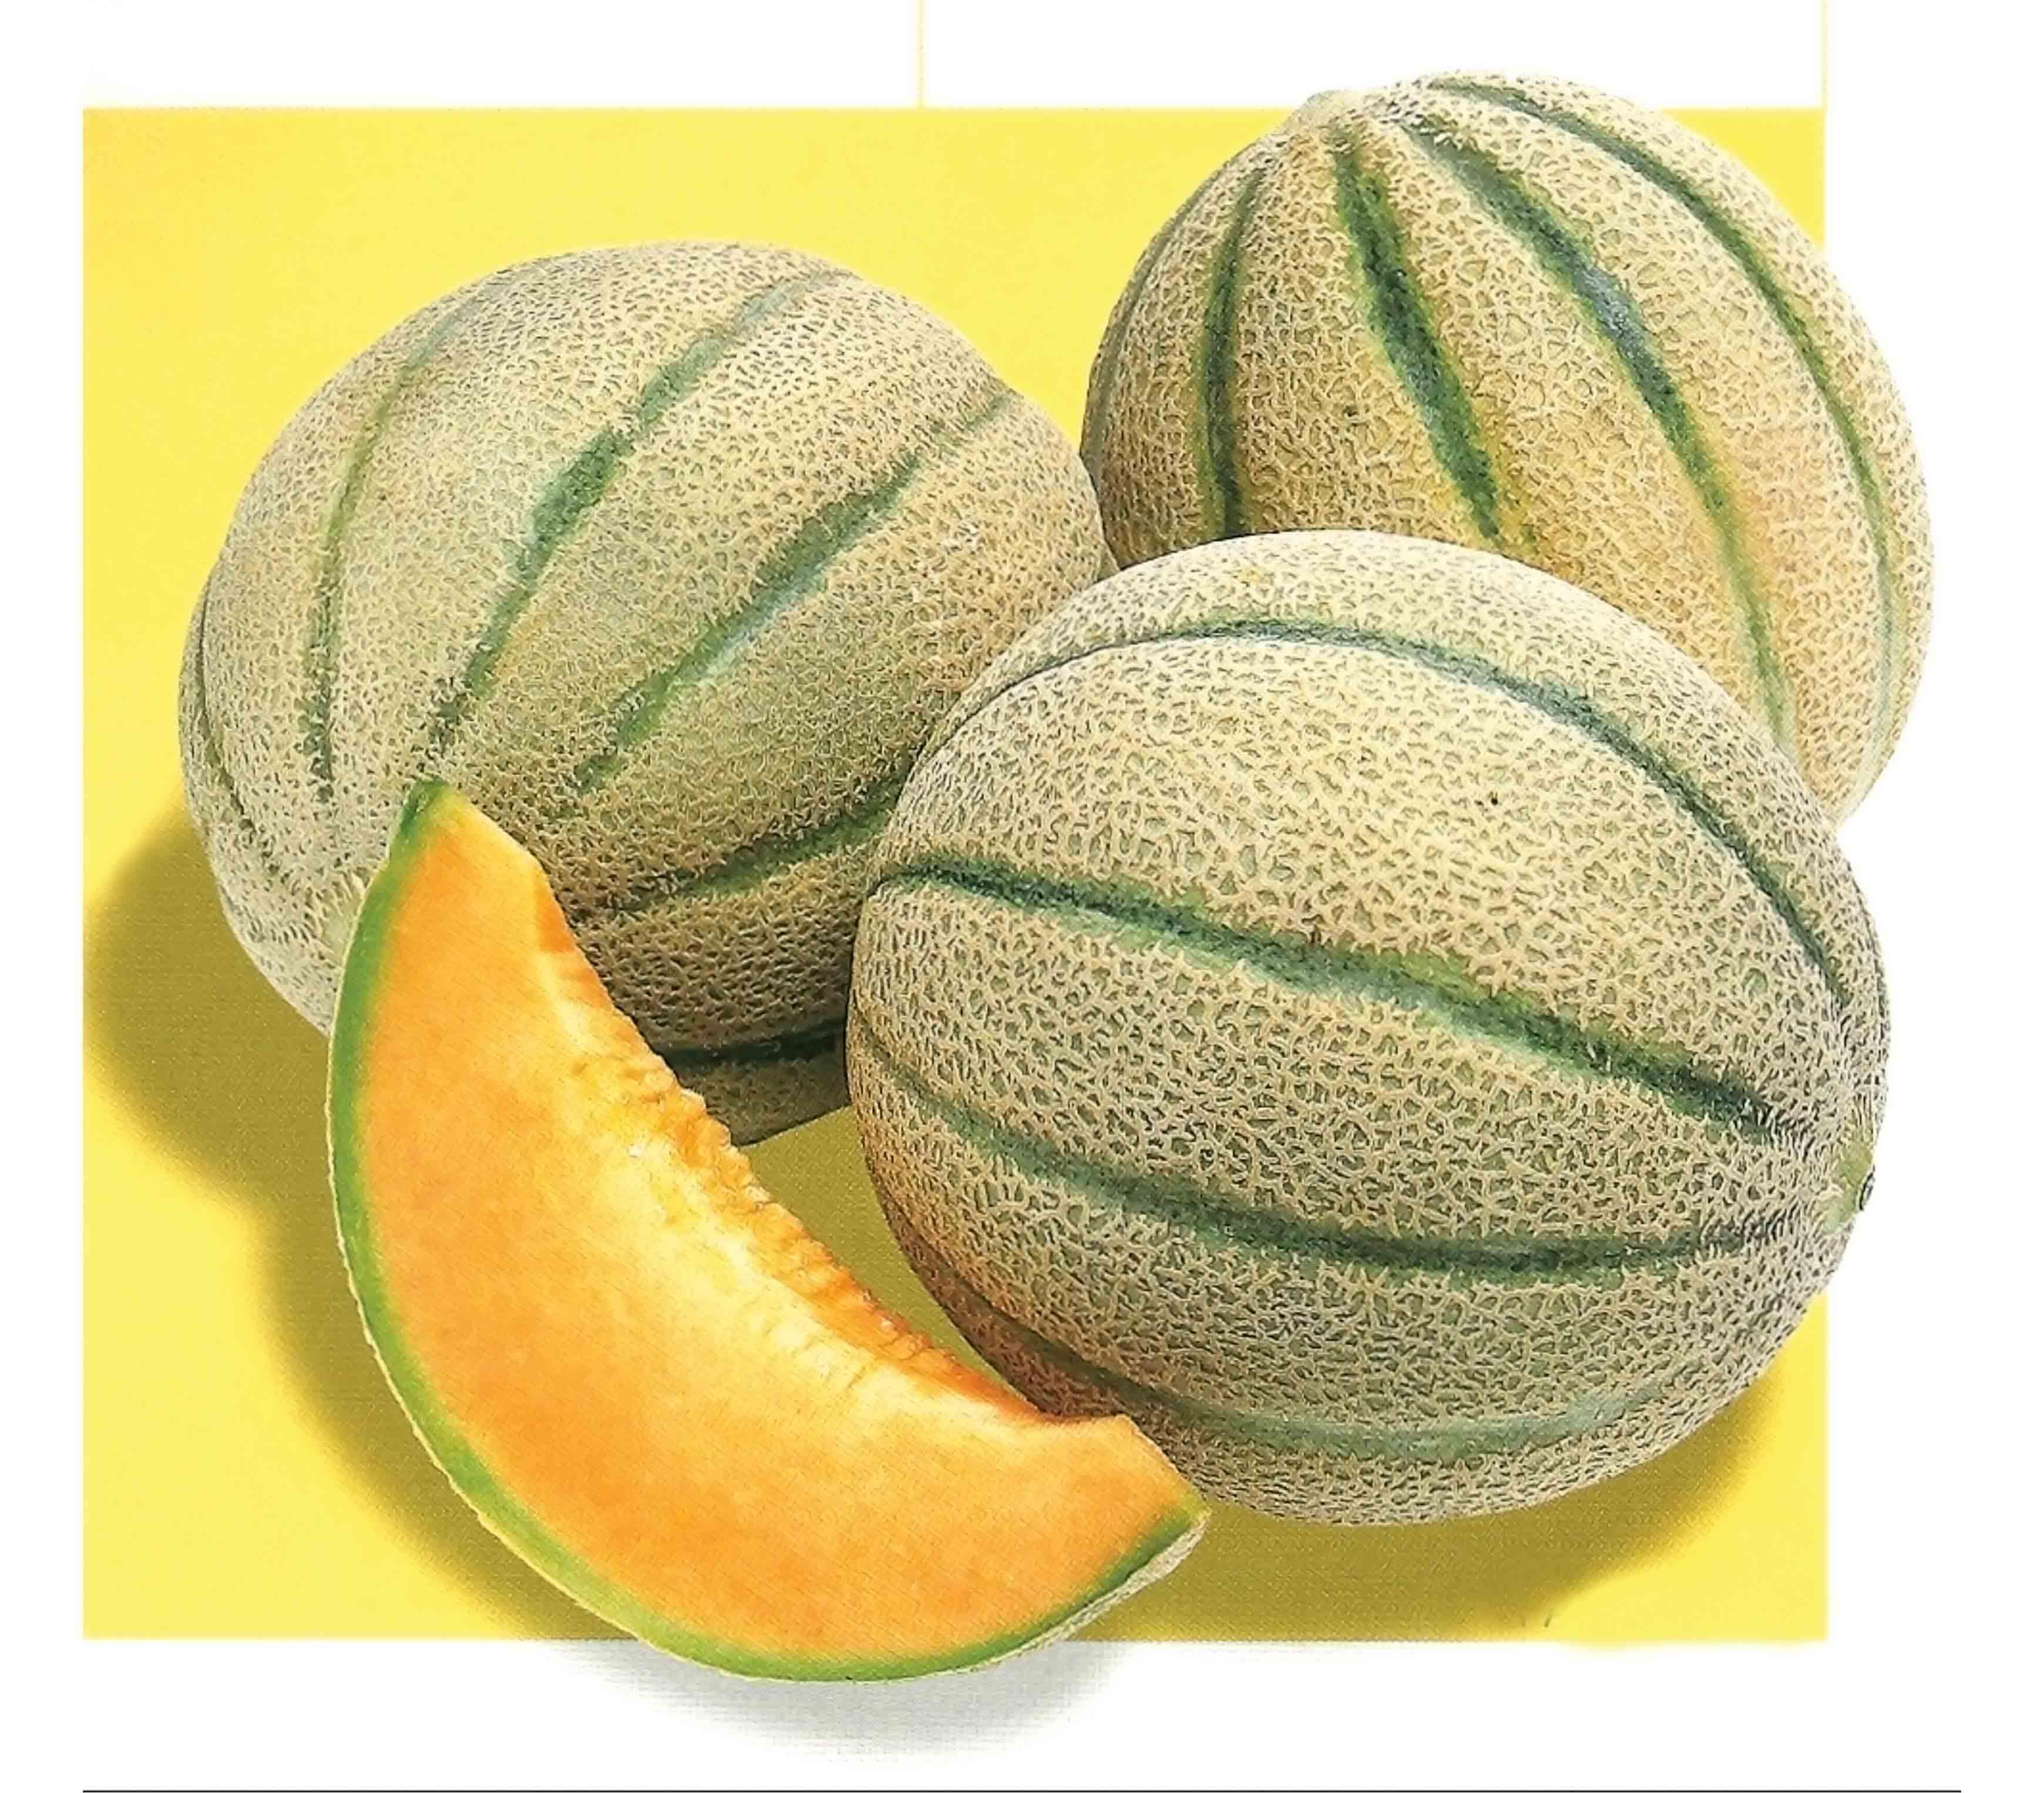 free photo melon raw organic nutrient free download jooinn